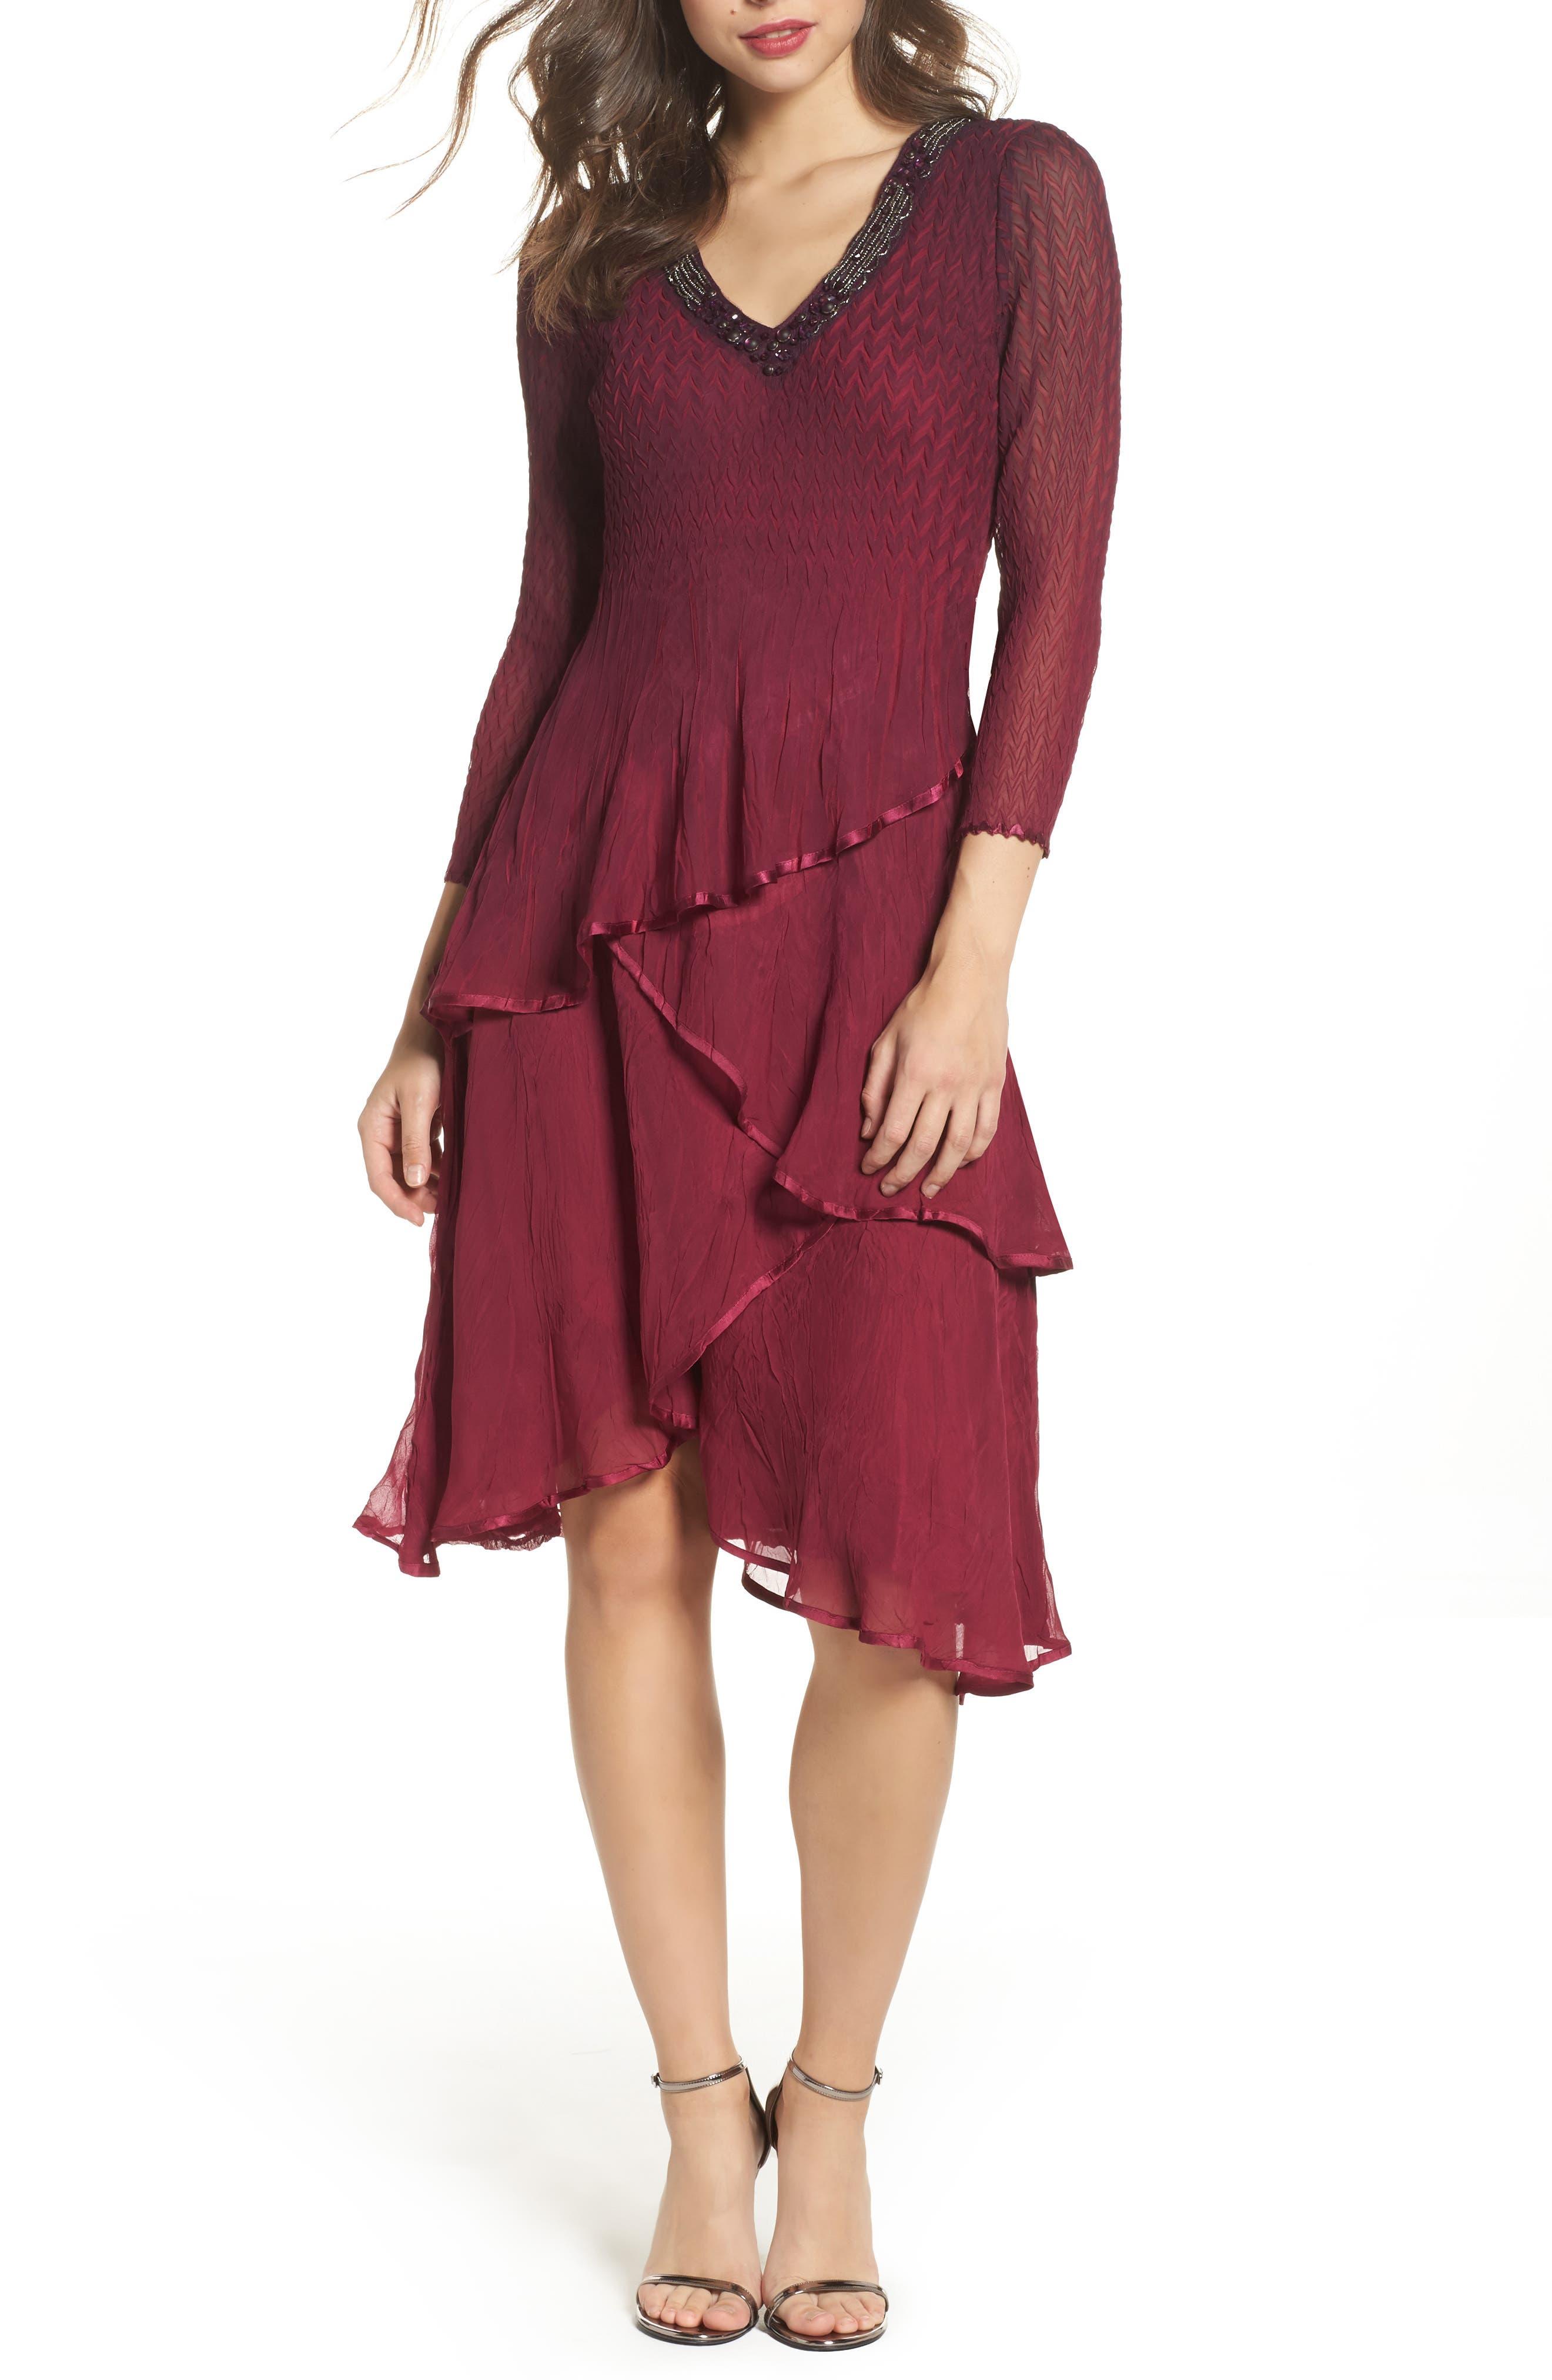 Alternate Image 1 Selected - Komarov Tiered Ombré Charmeuse & Chiffon Dress